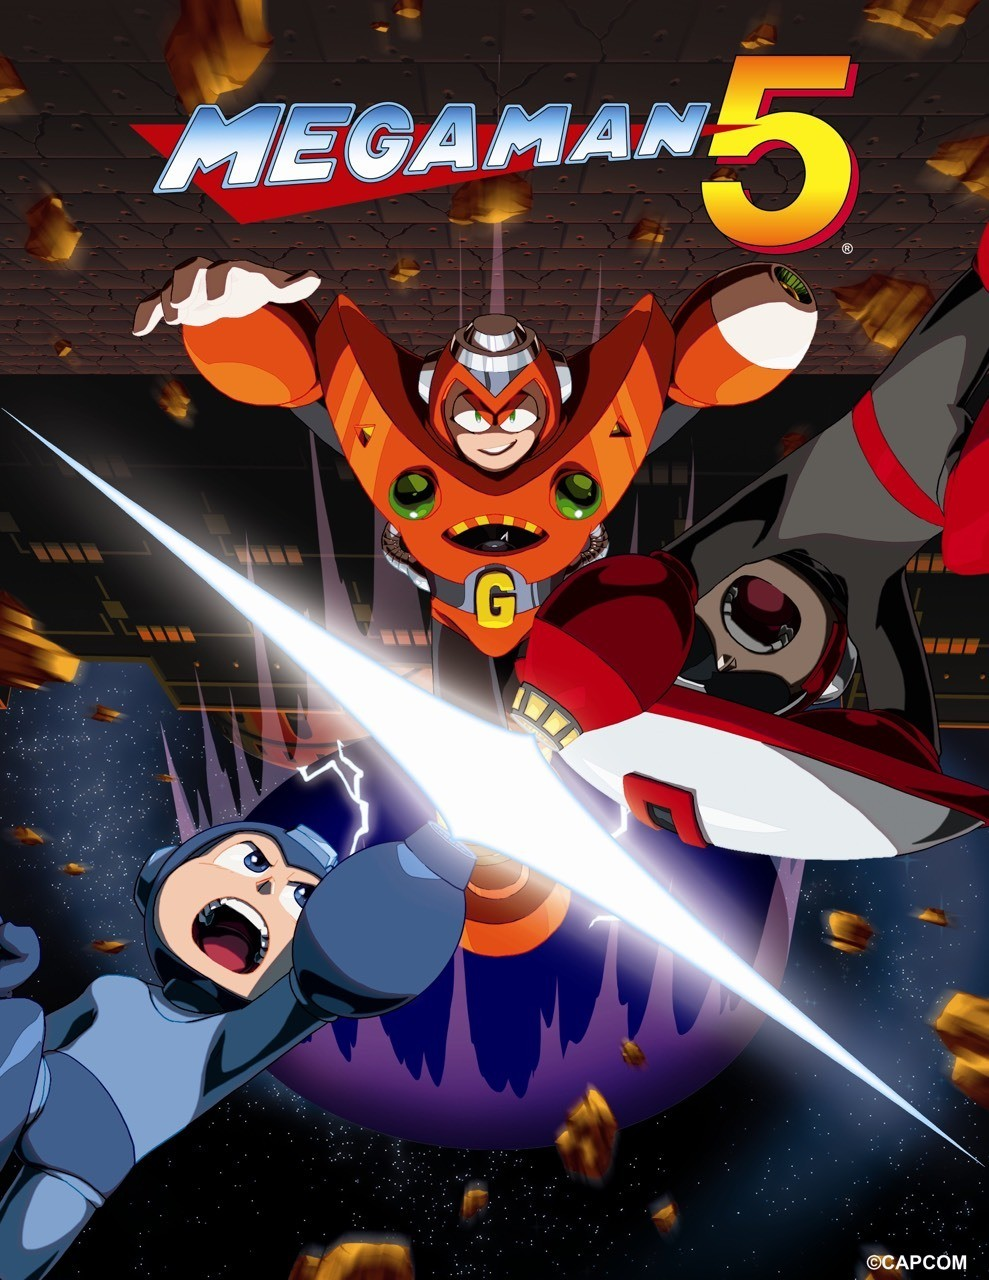 Mega Man V - Official art from the Mega Man Legacy Collection game.